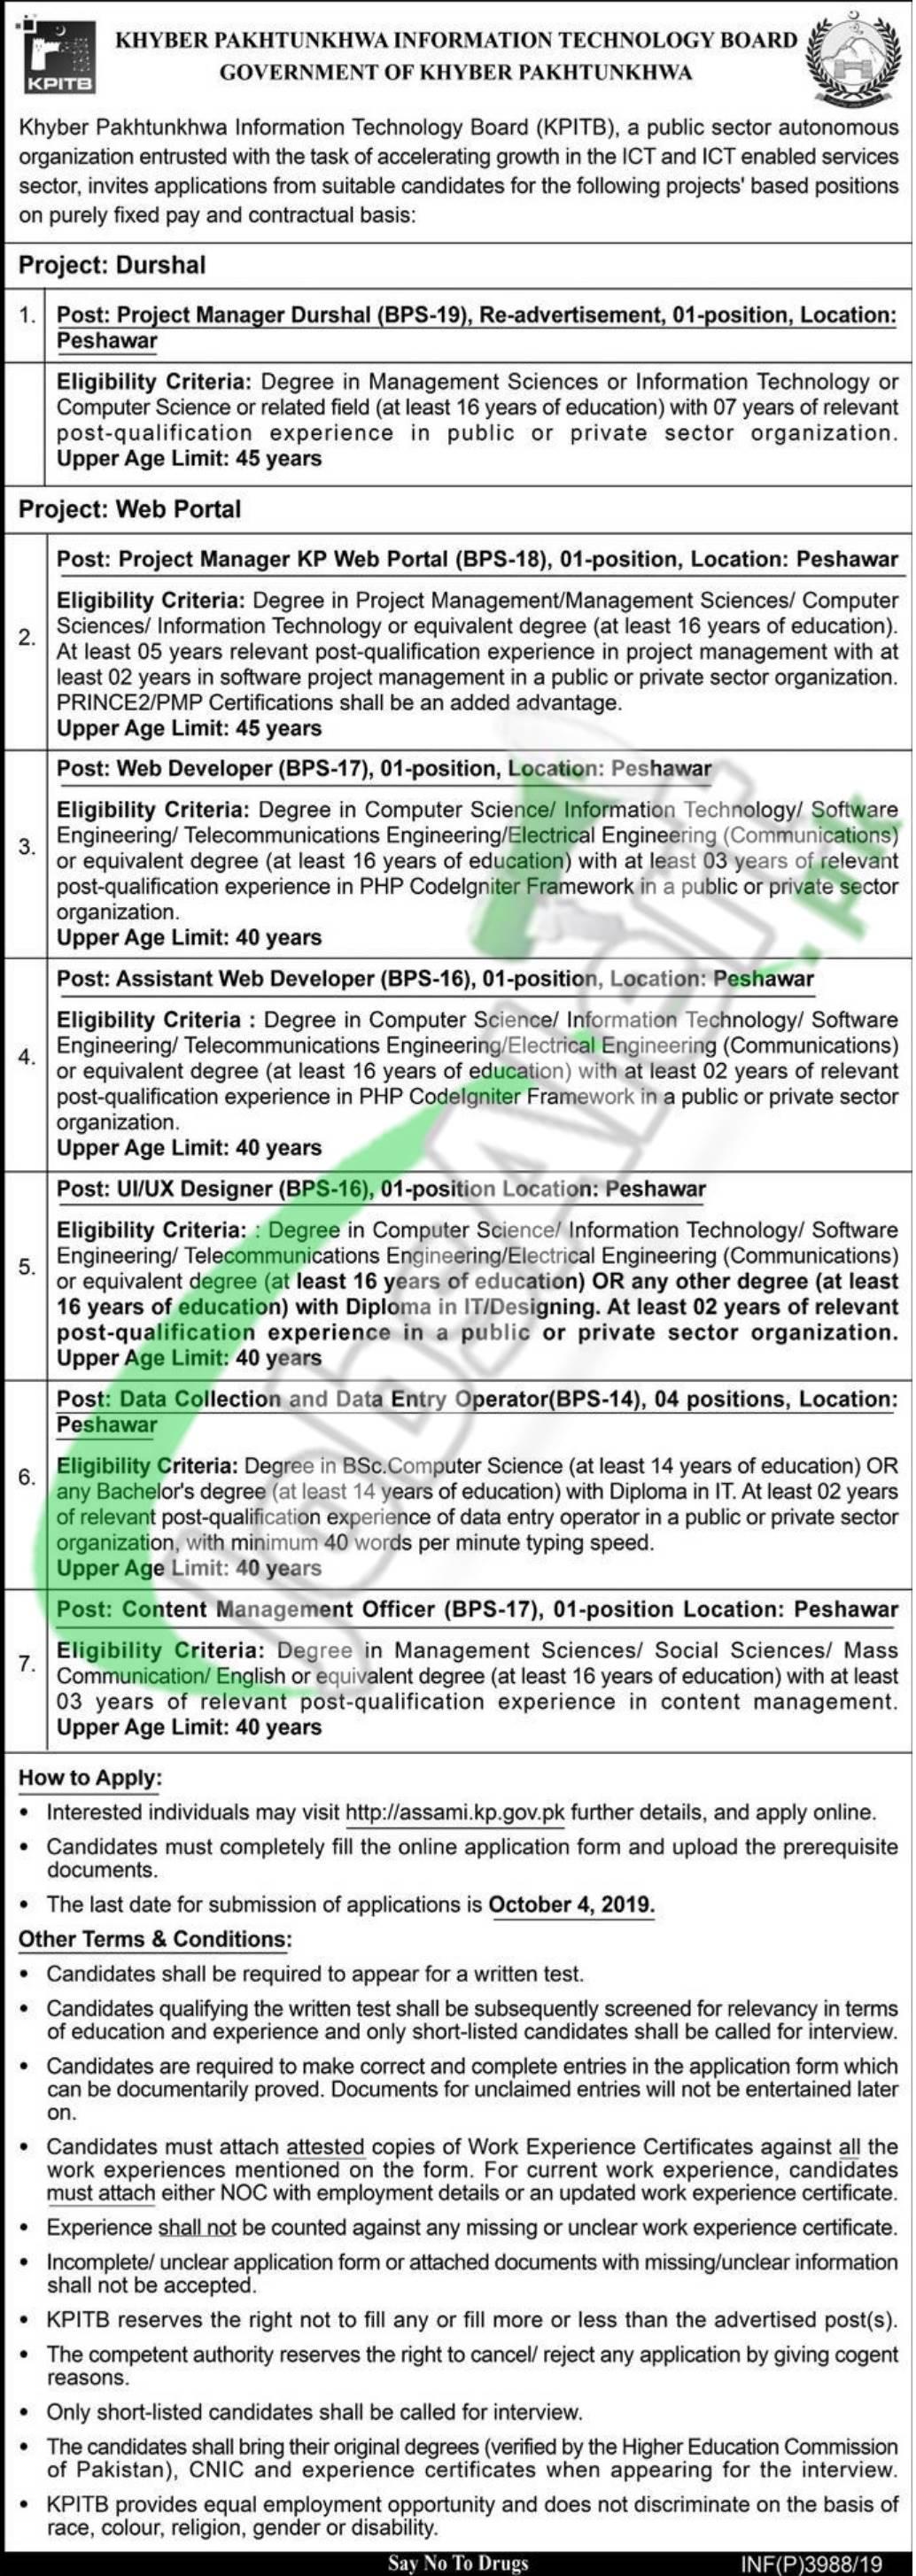 www.kpitb.gov.pk Jobs 2019